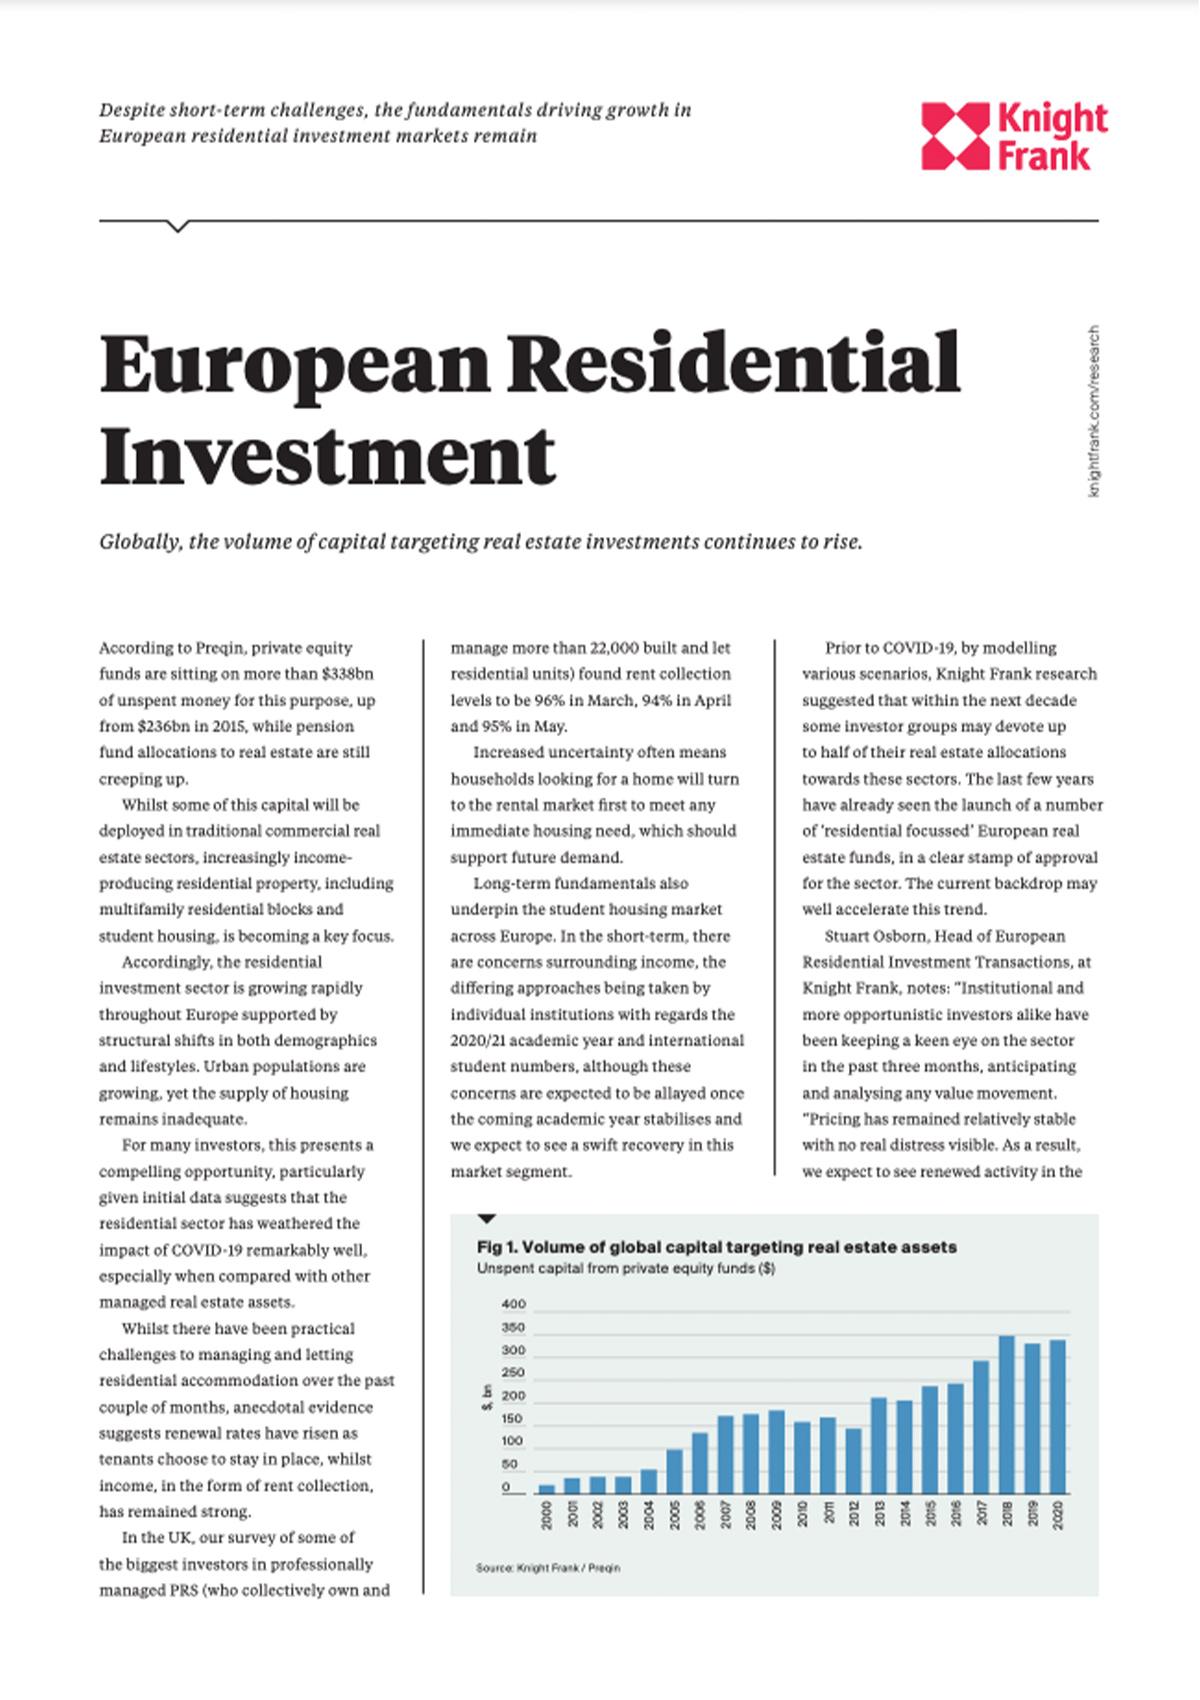 European Residential Investment